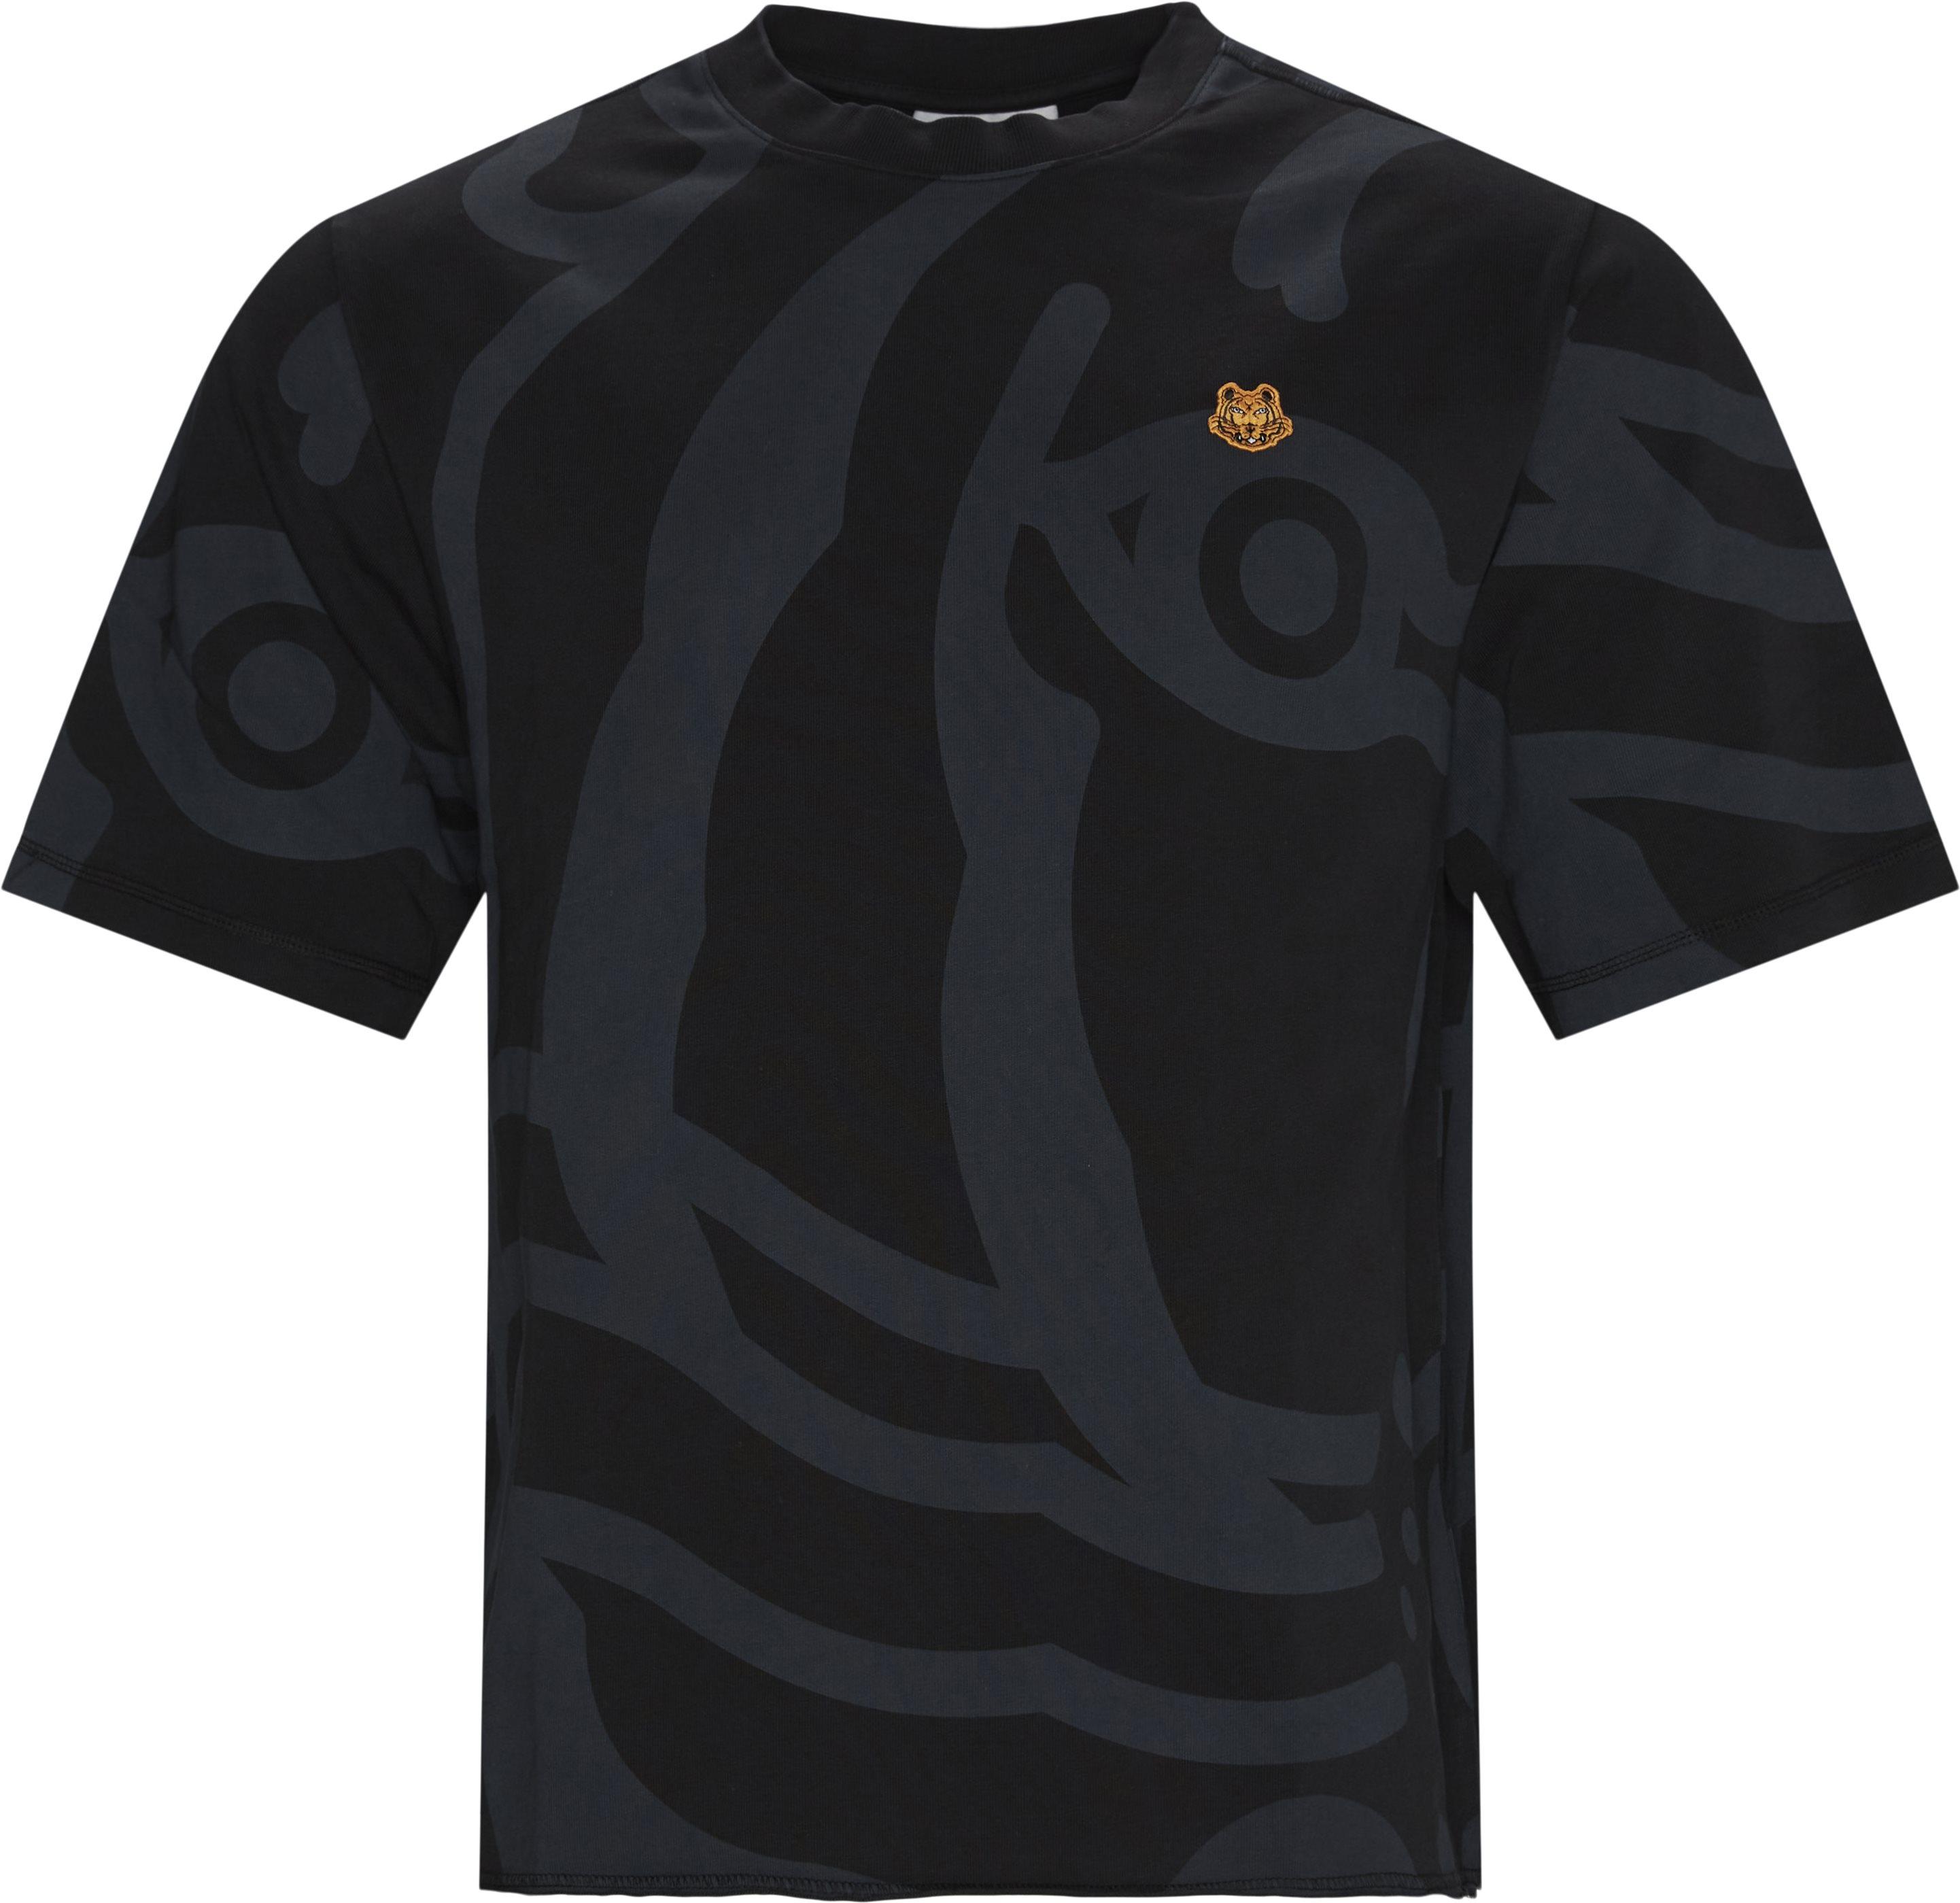 Print Tee - T-shirts - Oversize fit - Sort